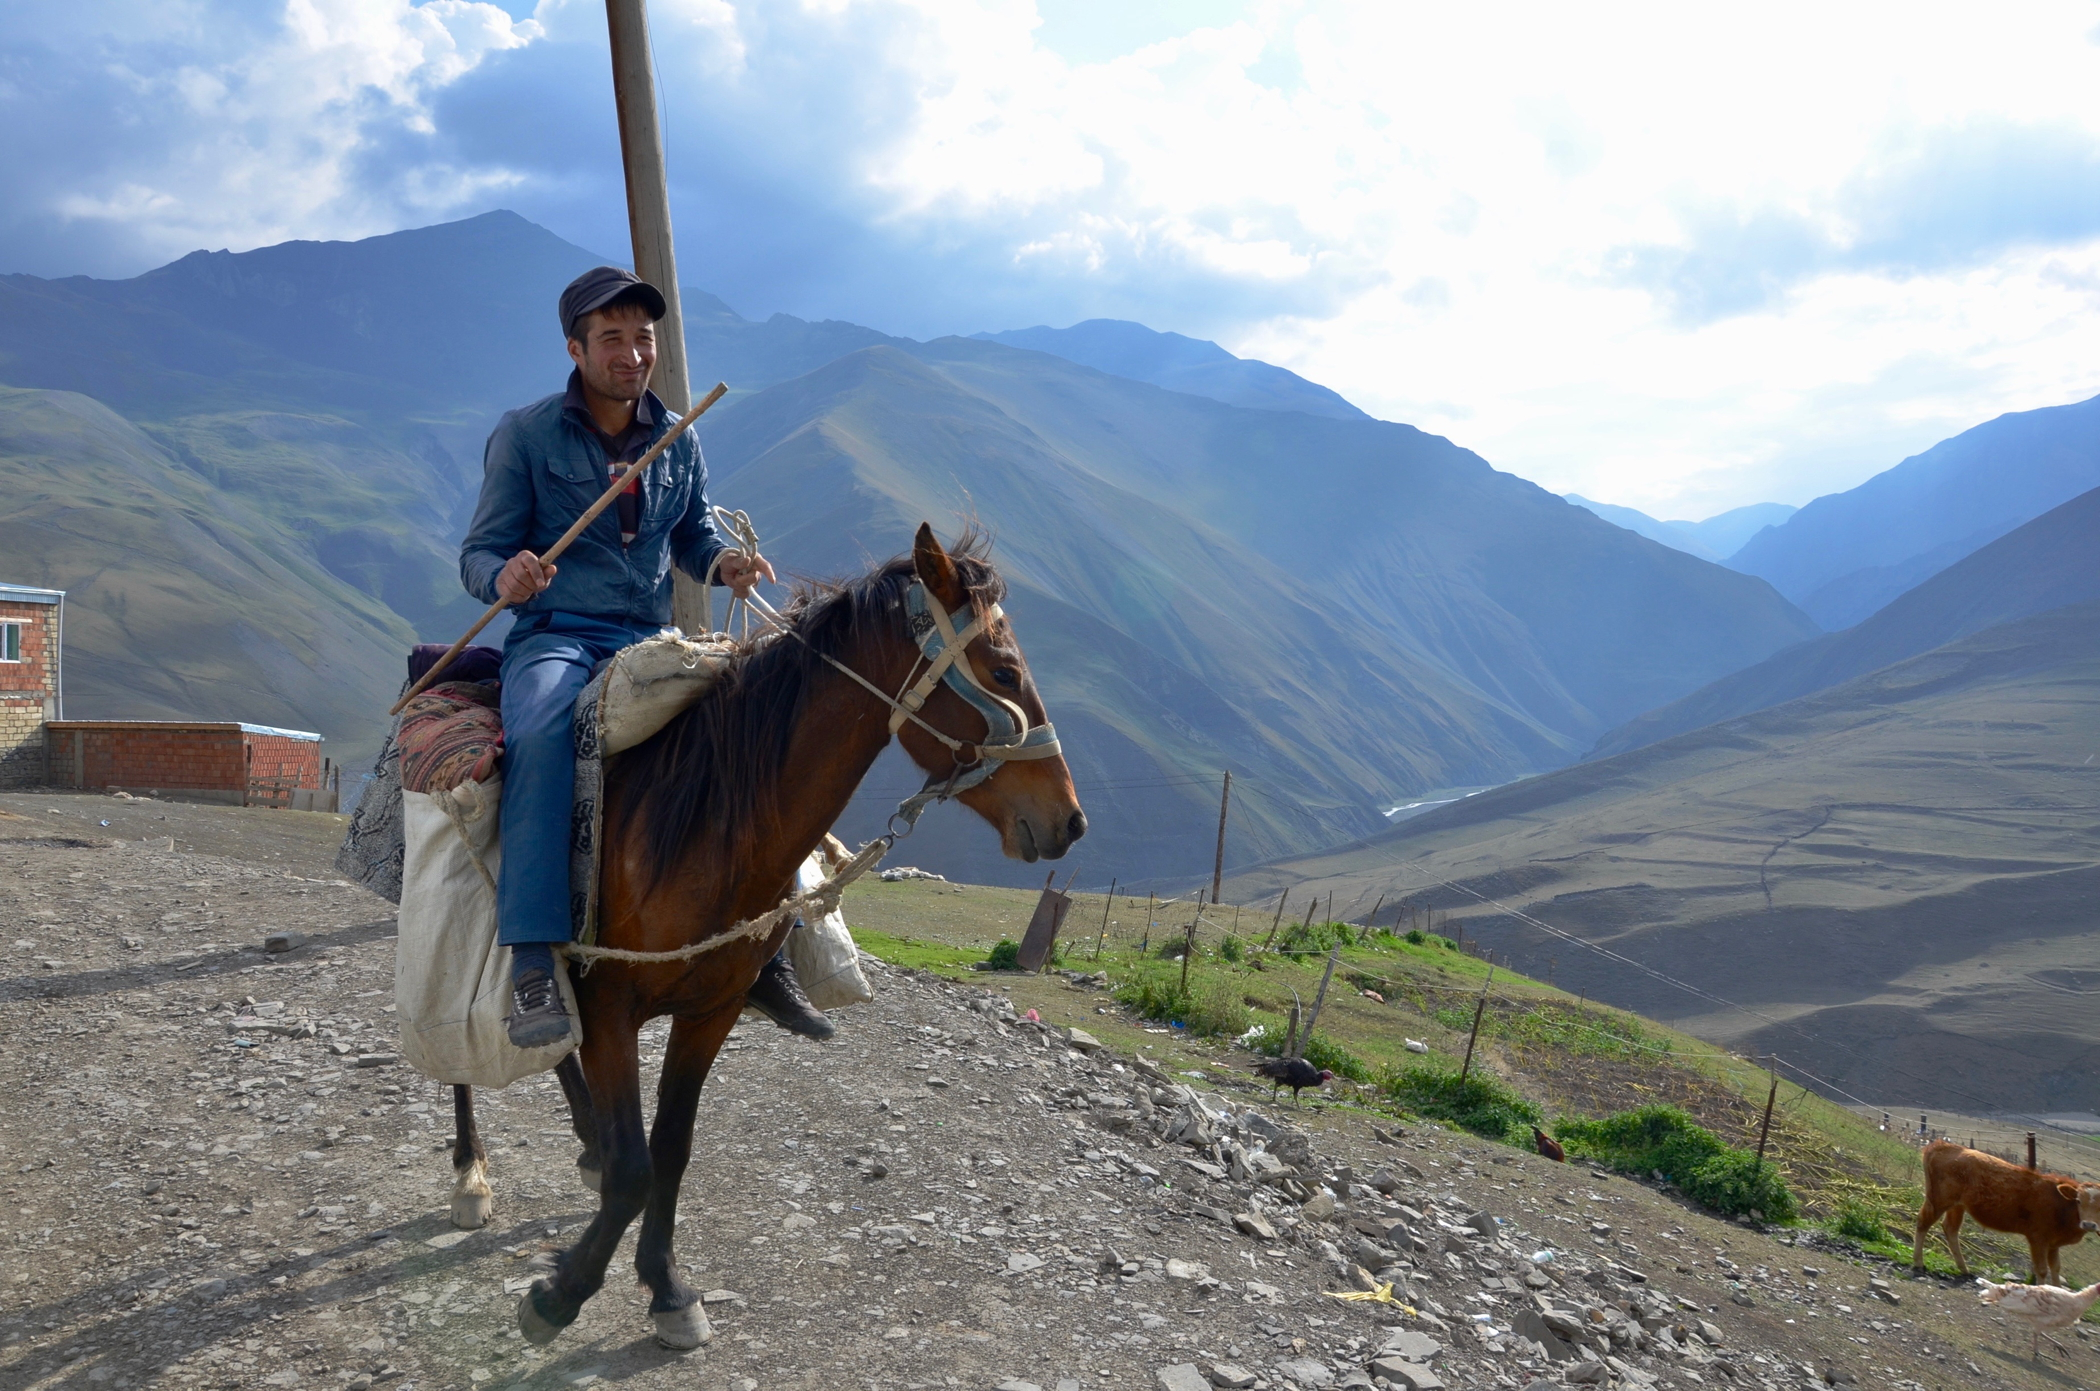 azerbaijan travel Xinaliq horse rider